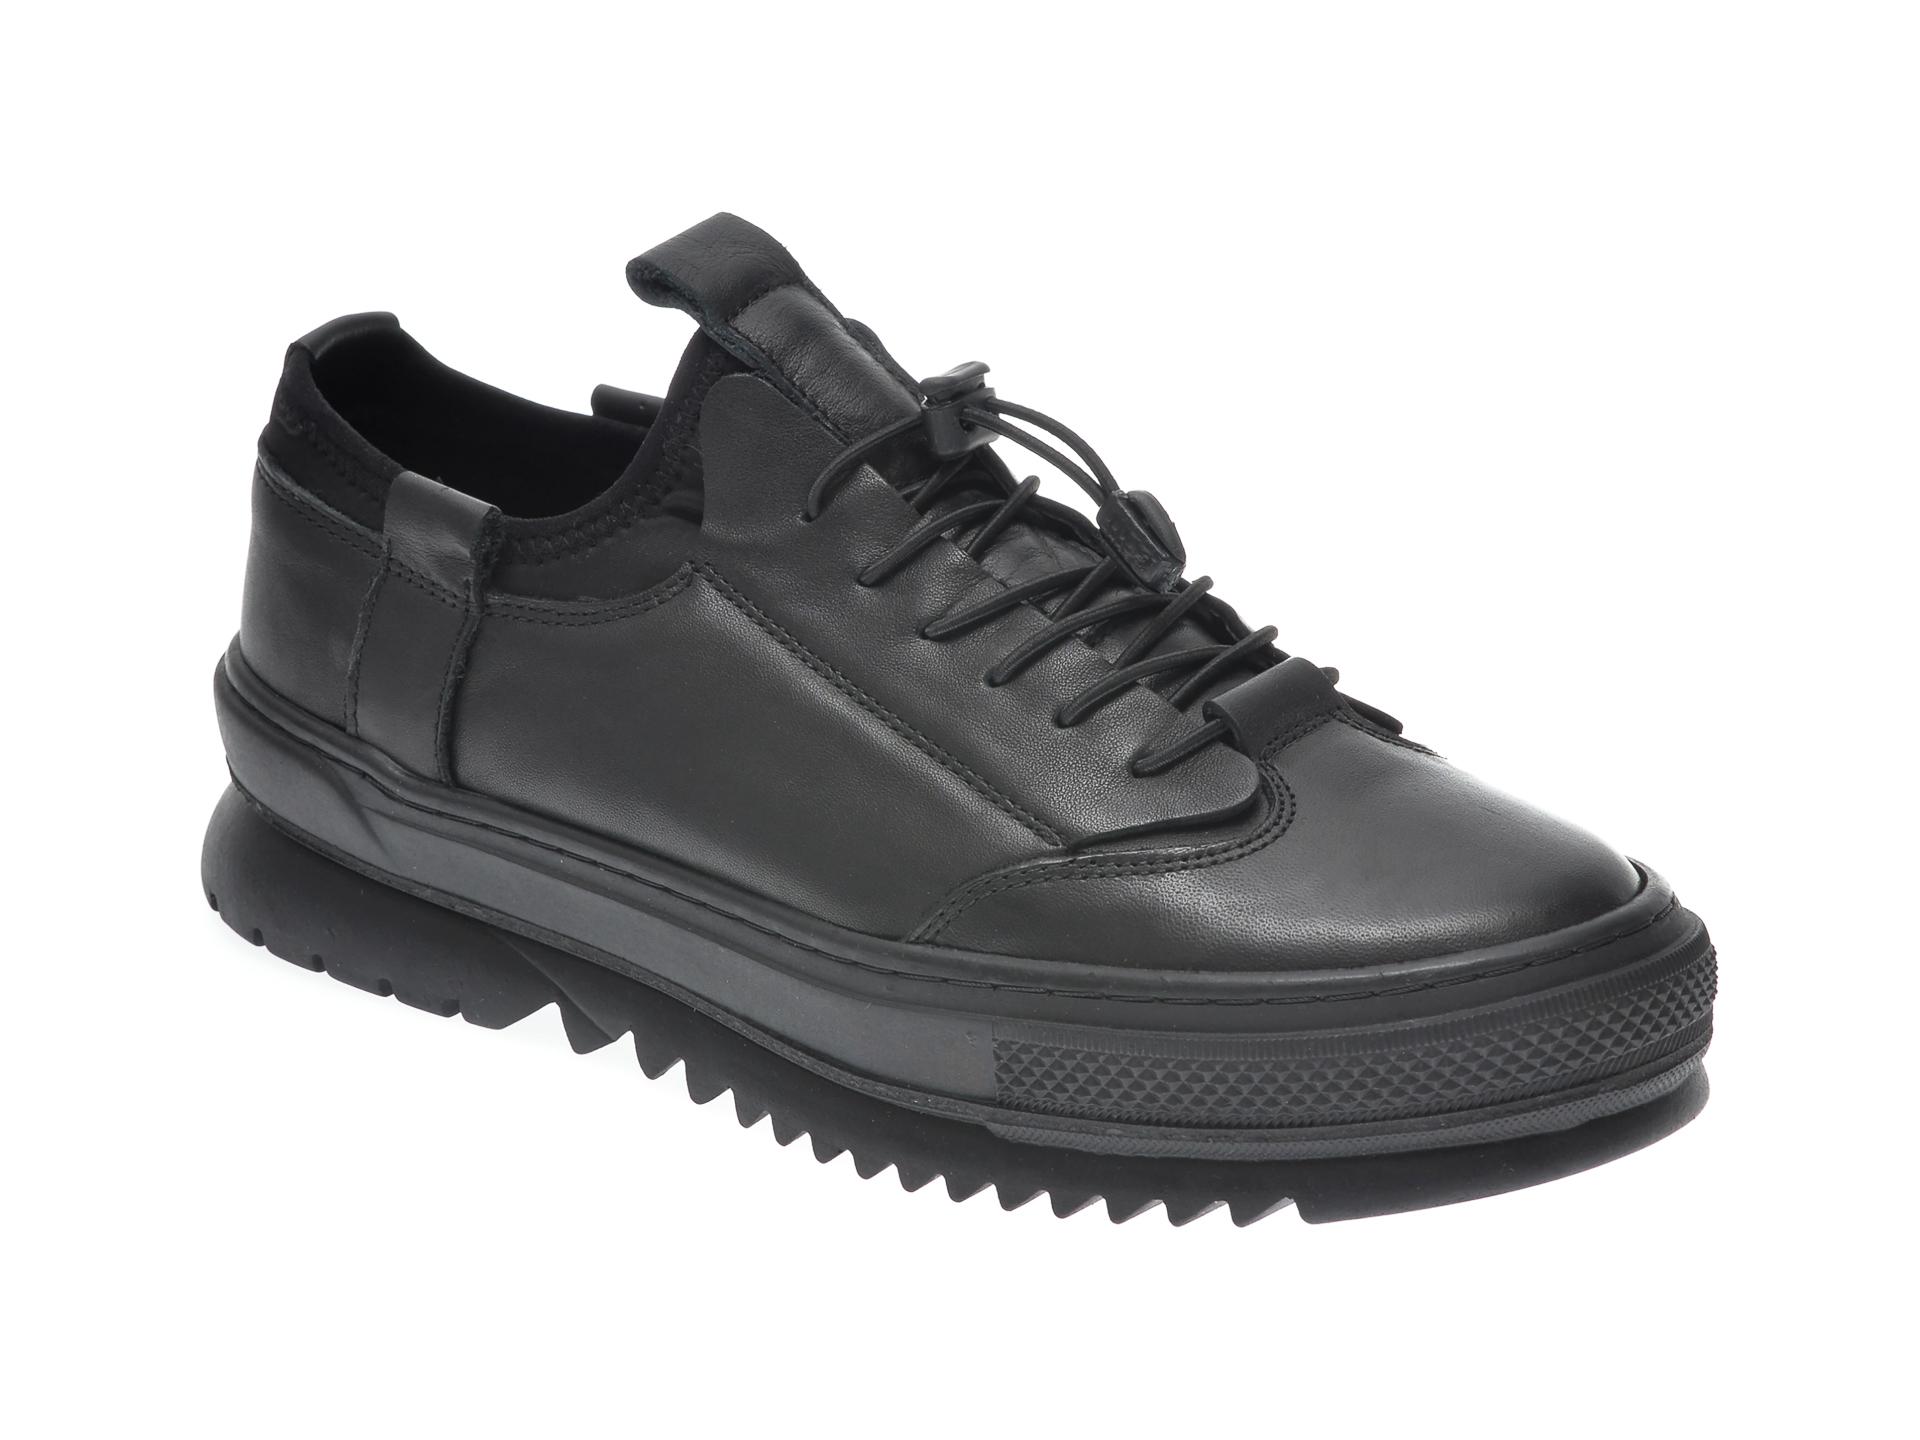 Pantofi OTTER negri, 402, din piele naturala New